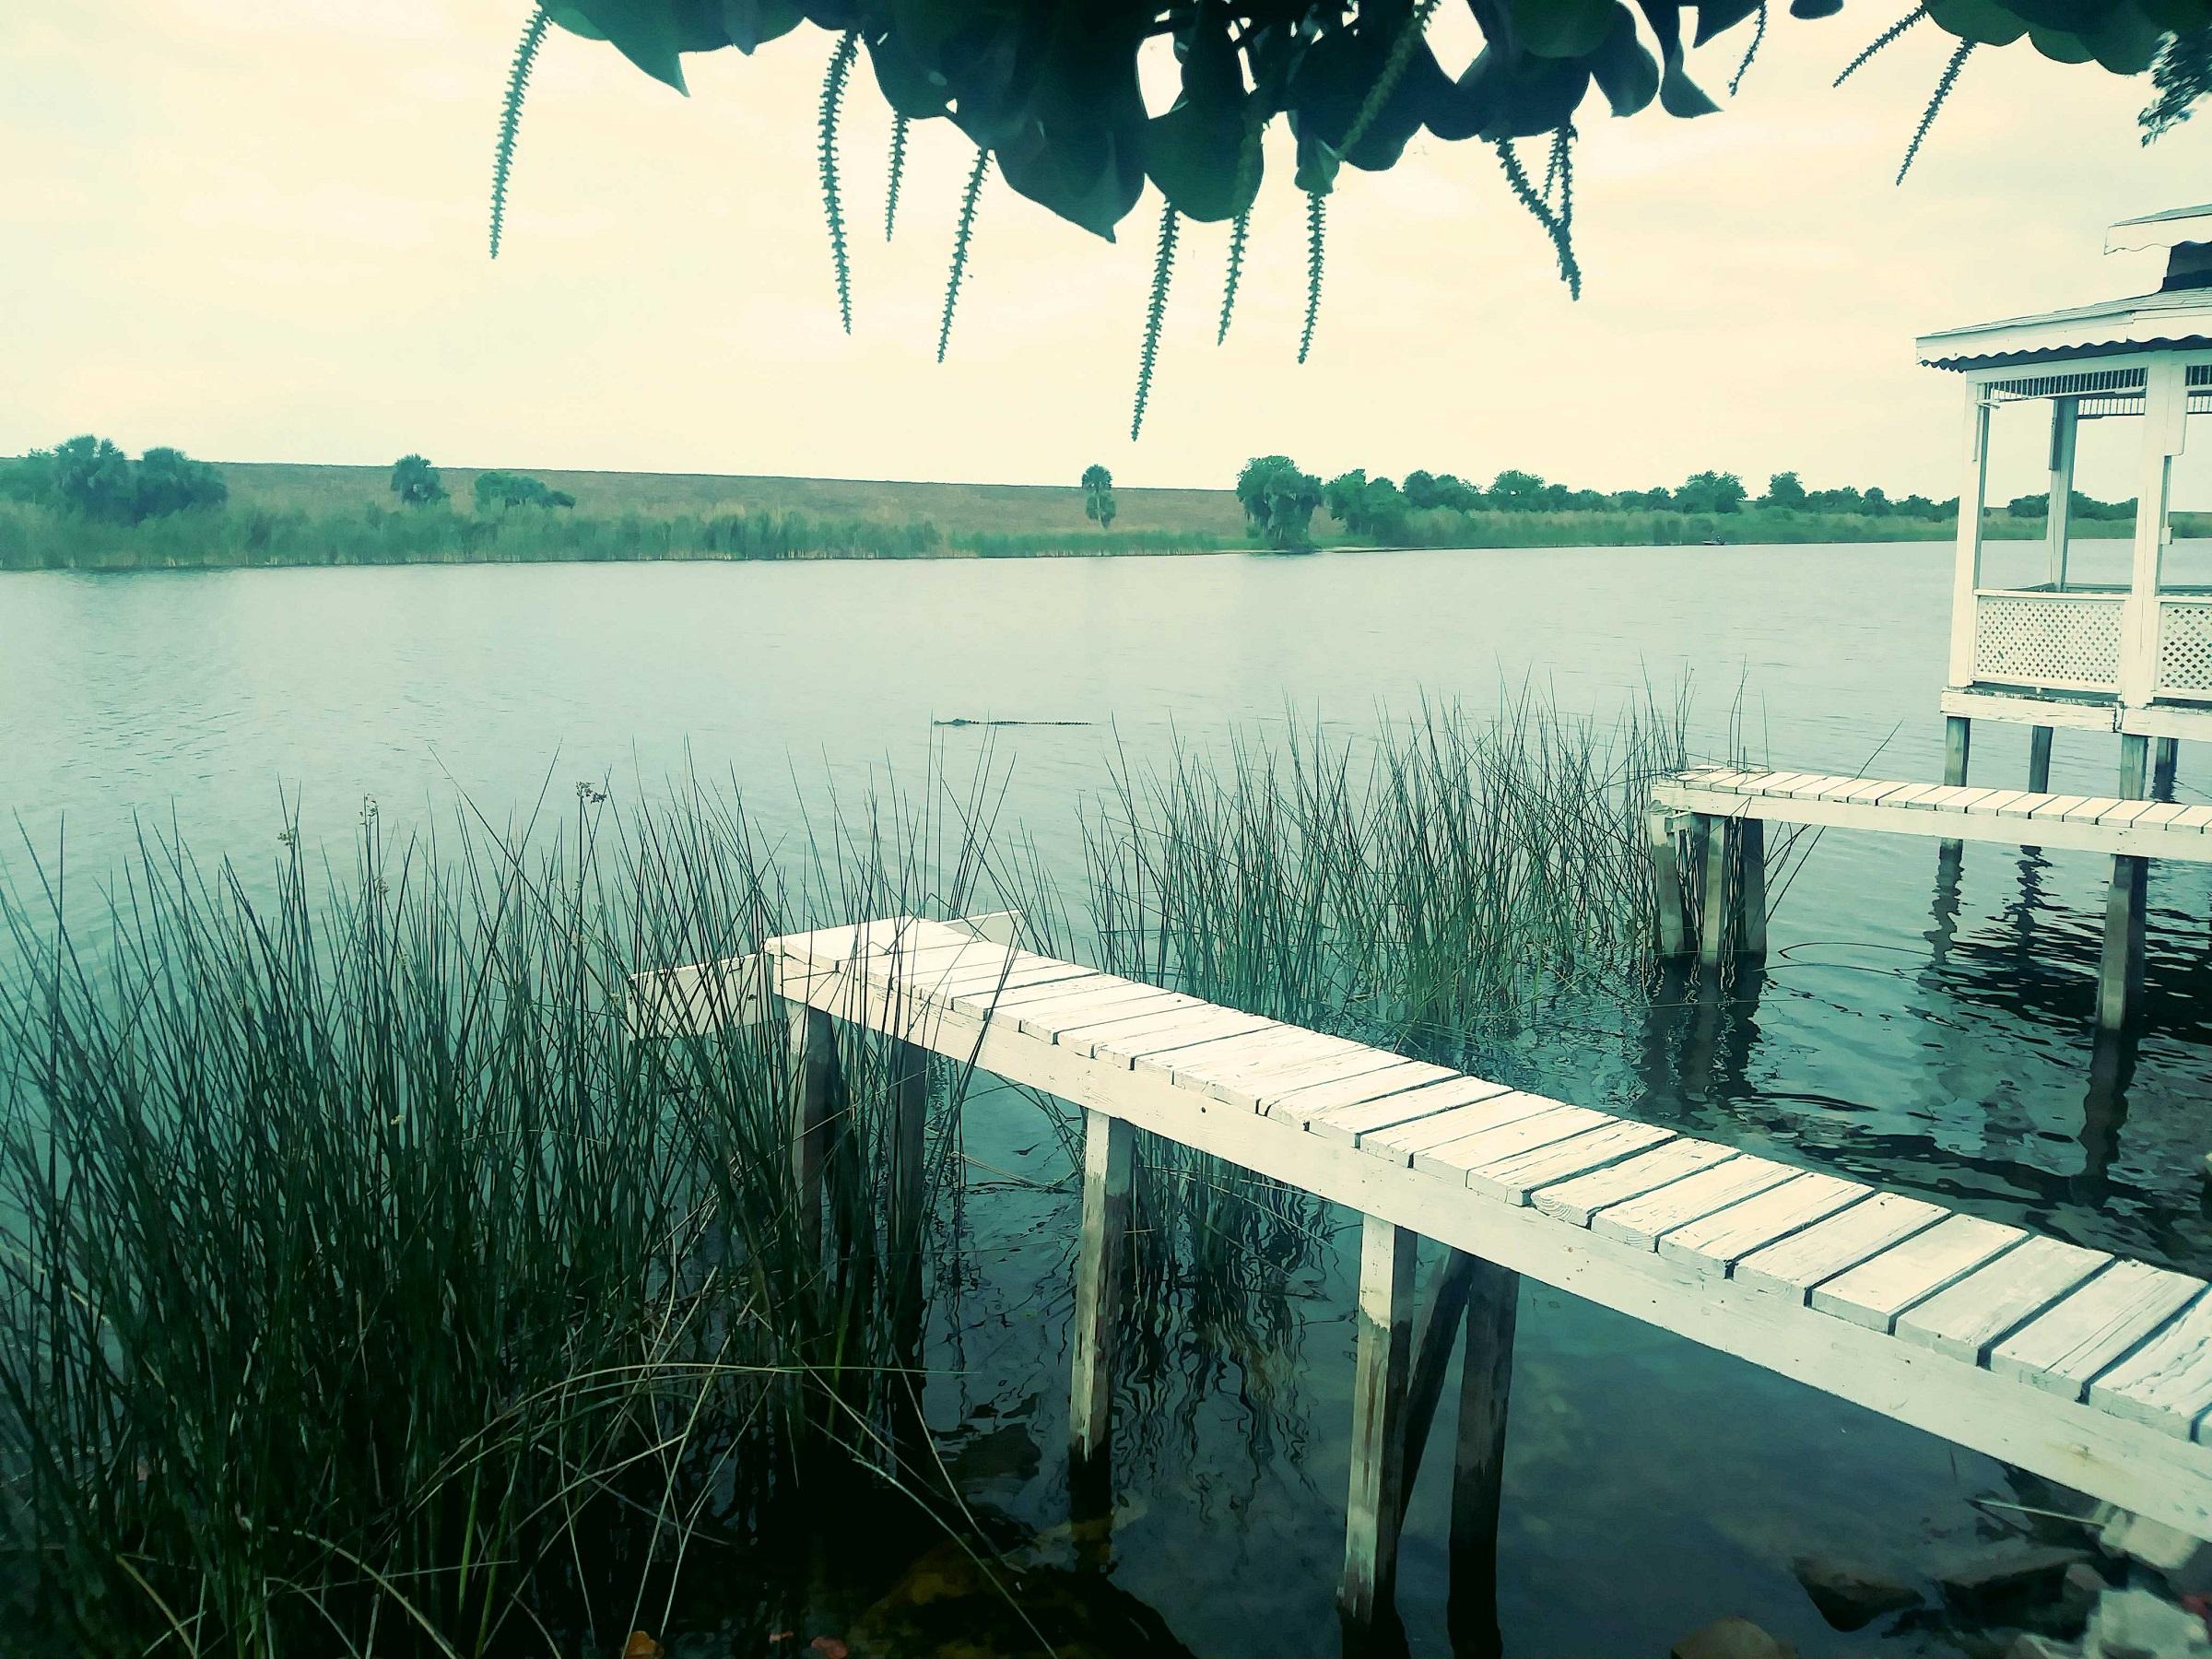 alligator swims past the lakeside gazebo behind the tiny house village